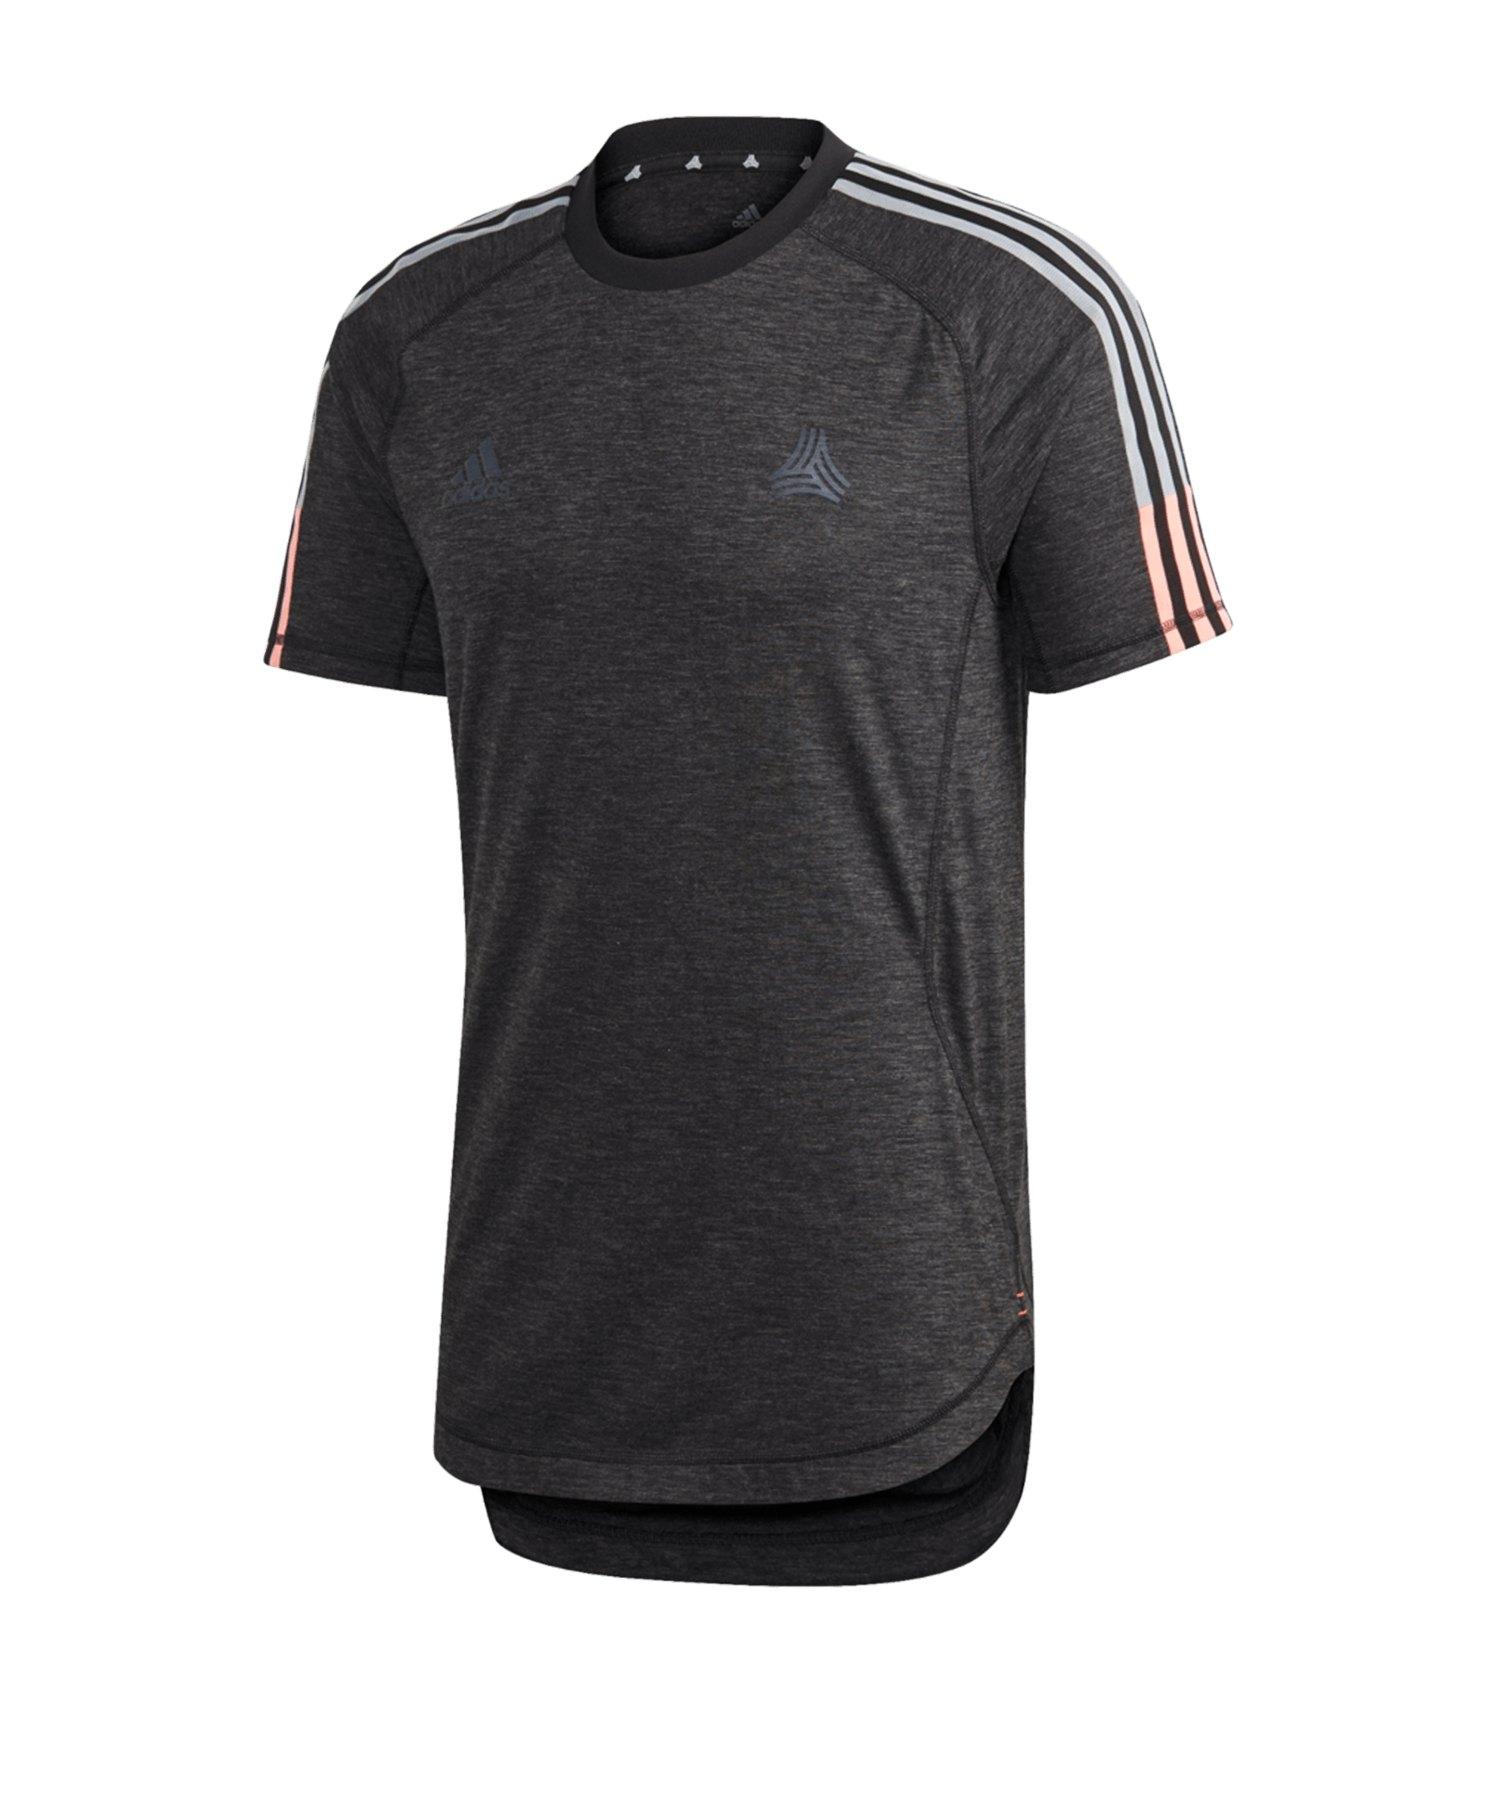 adidas Tango Tec T-Shirt Schwarz - schwarz